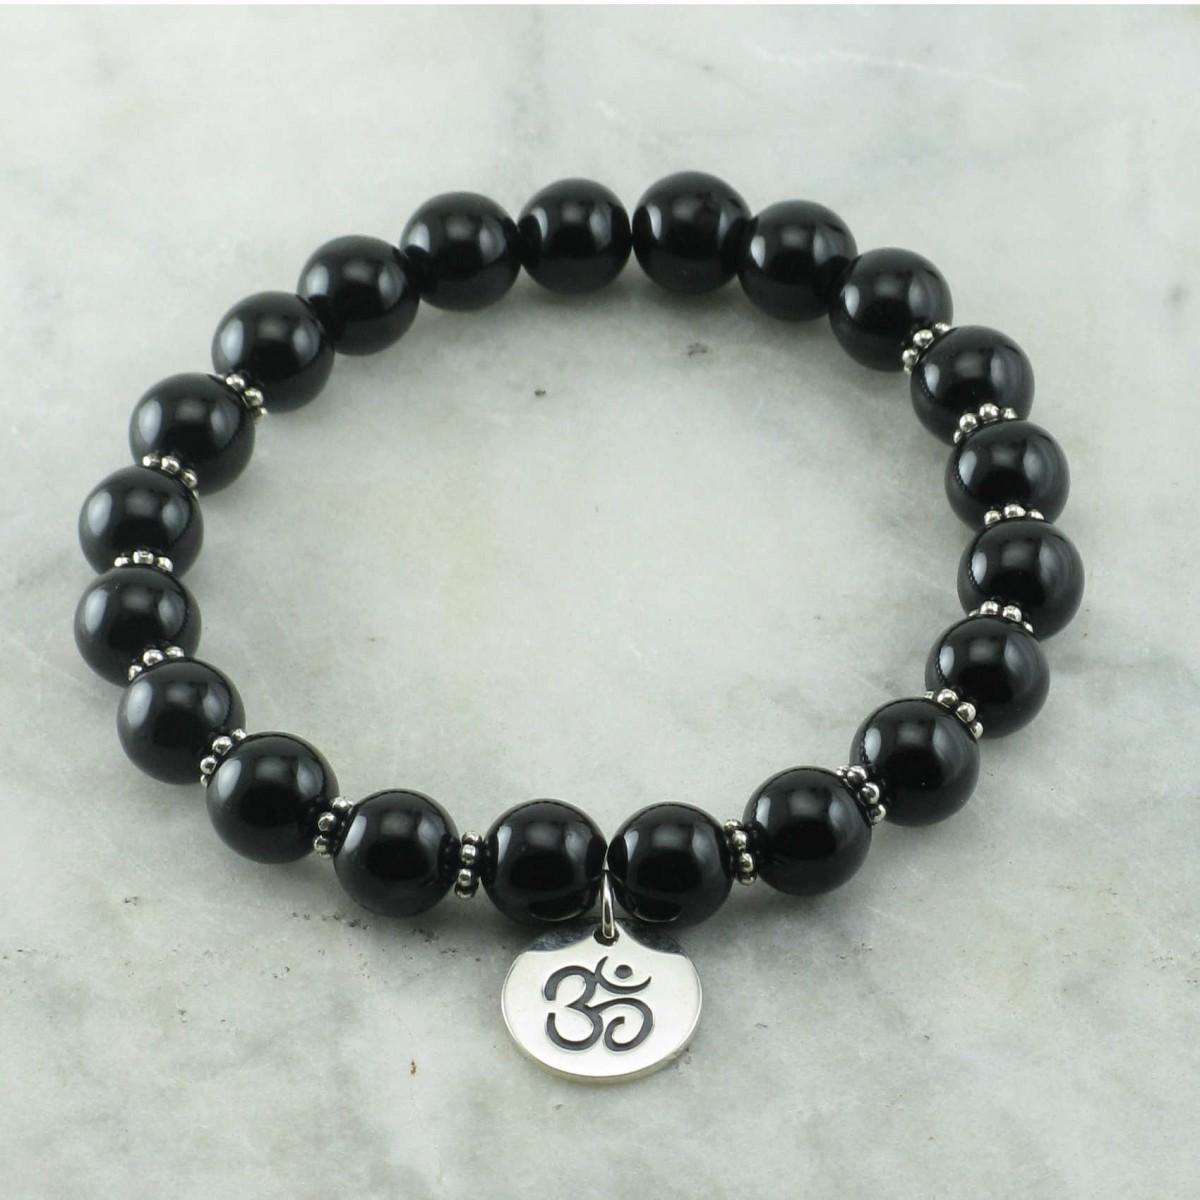 Perception_Chakra_Mala_Bracelet_21_Black_Jade_Mala_Beads